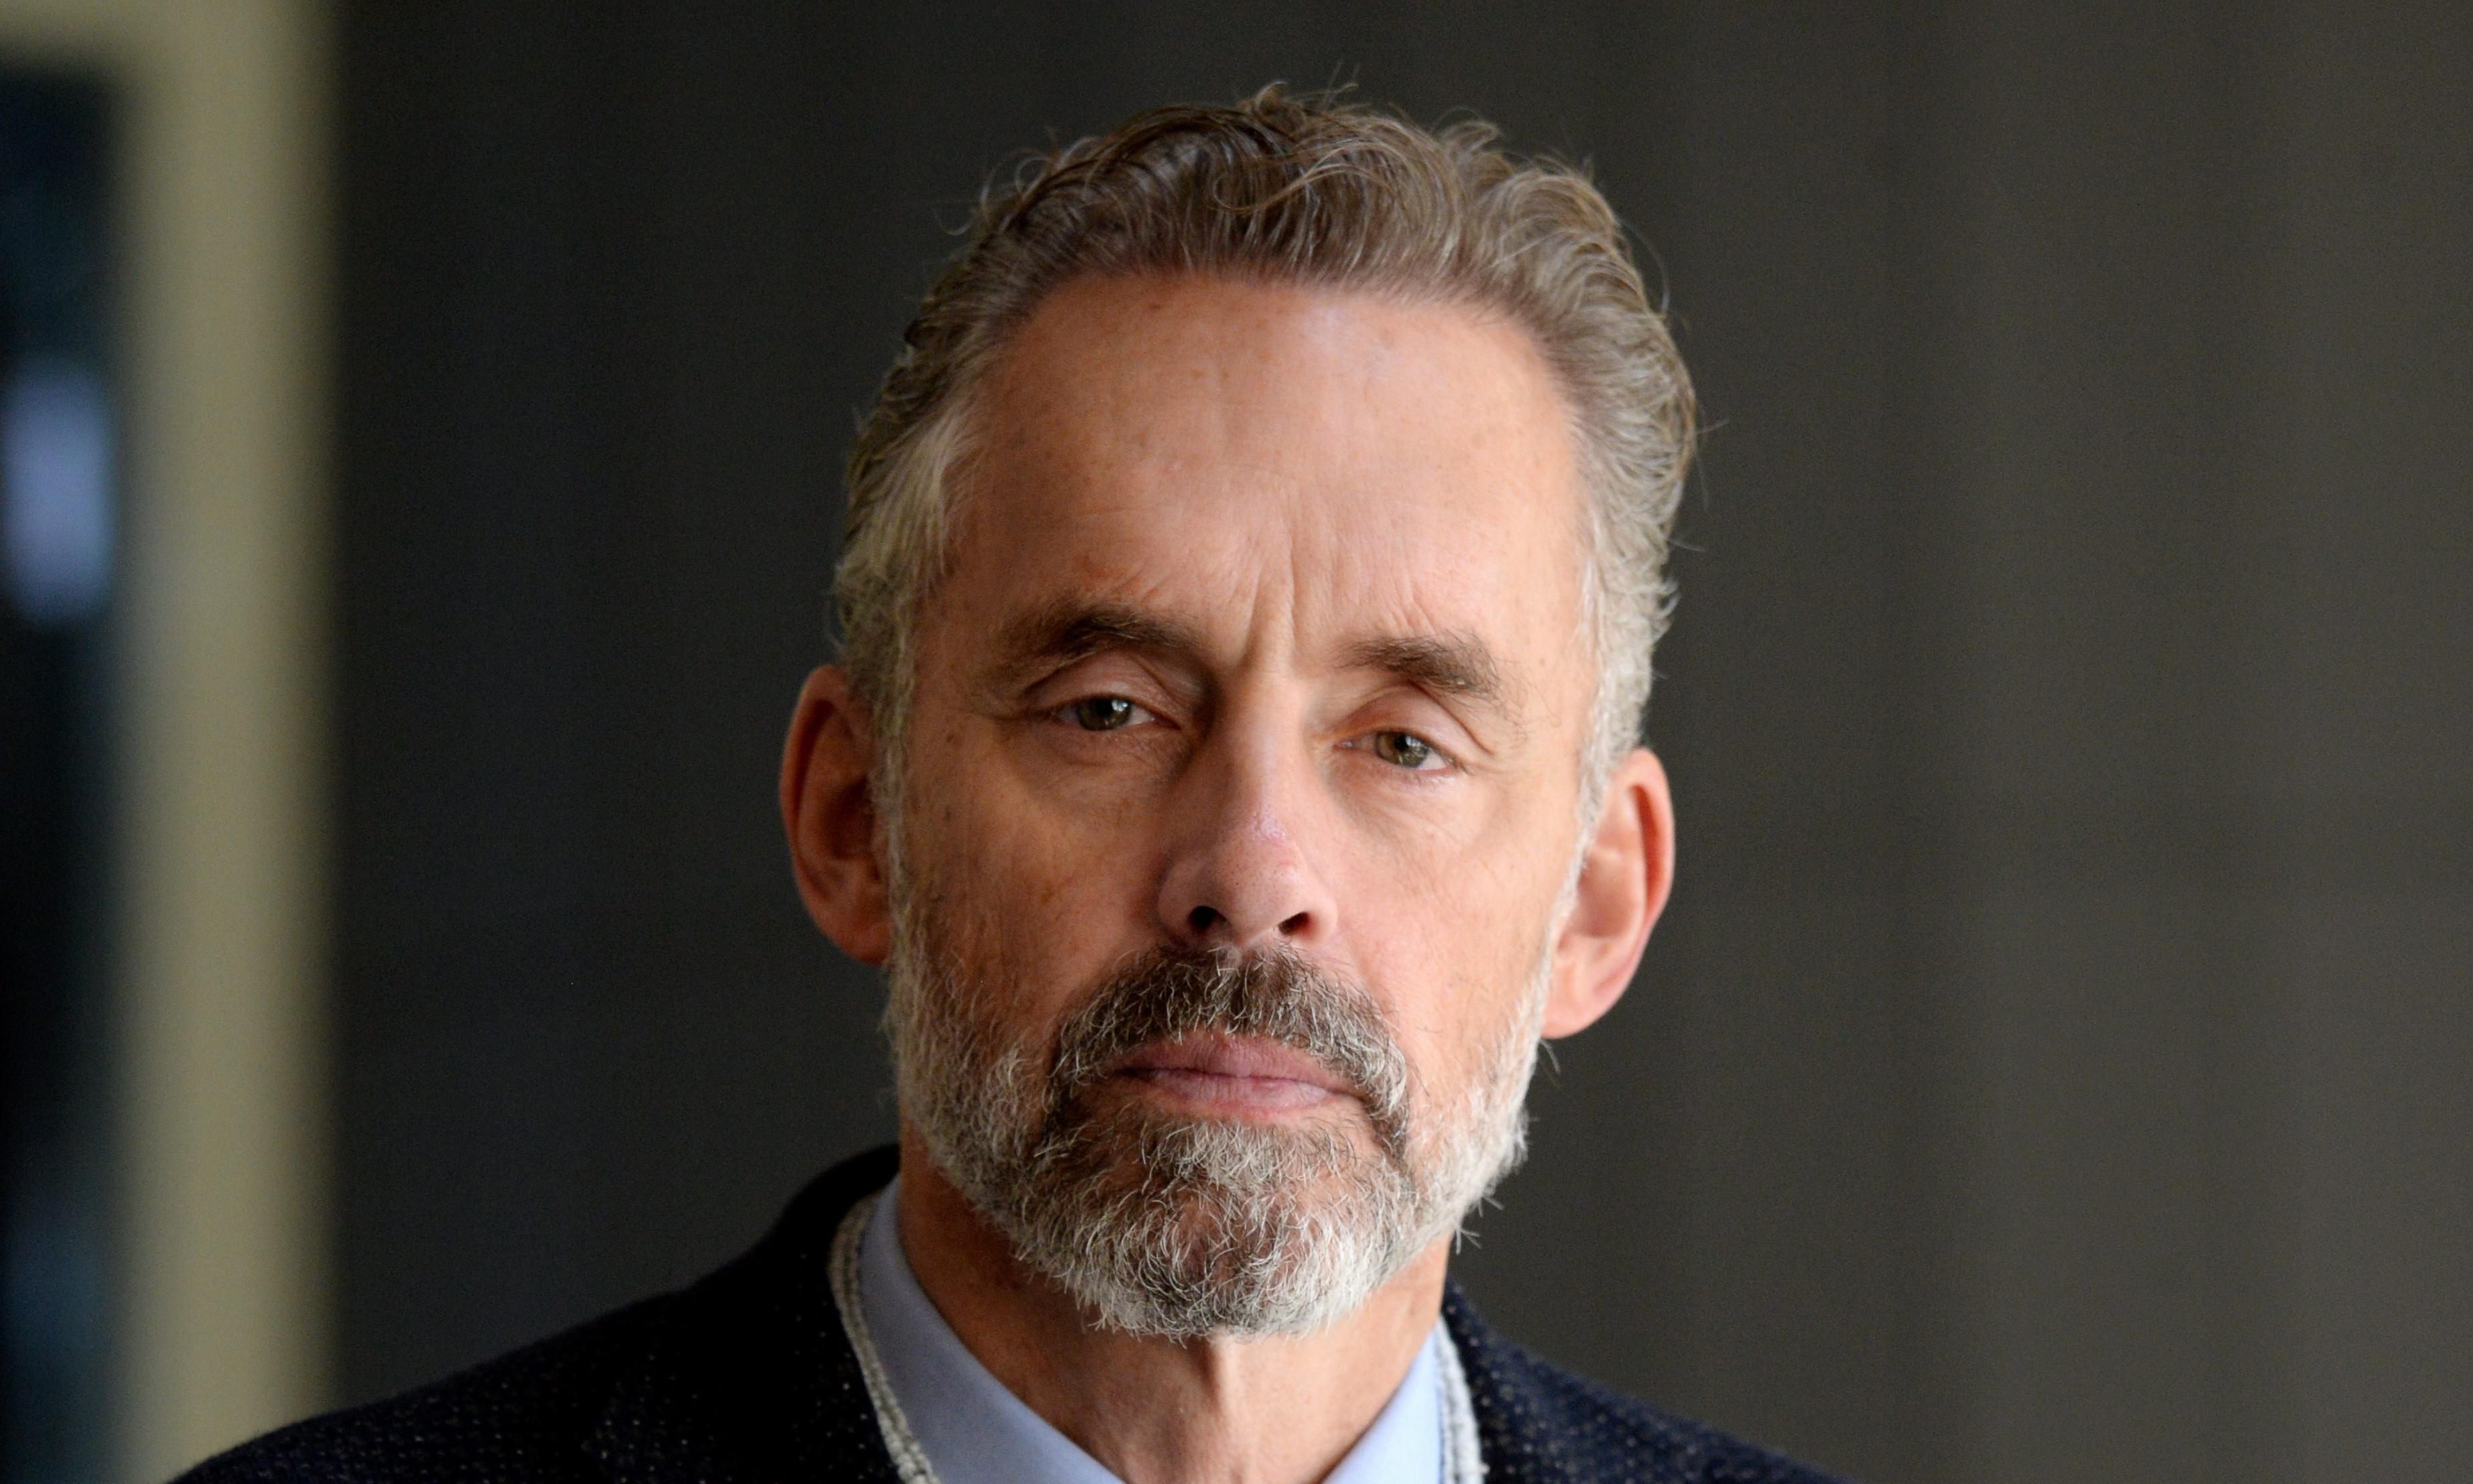 Cambridge University rescinds Jordan Peterson invitation